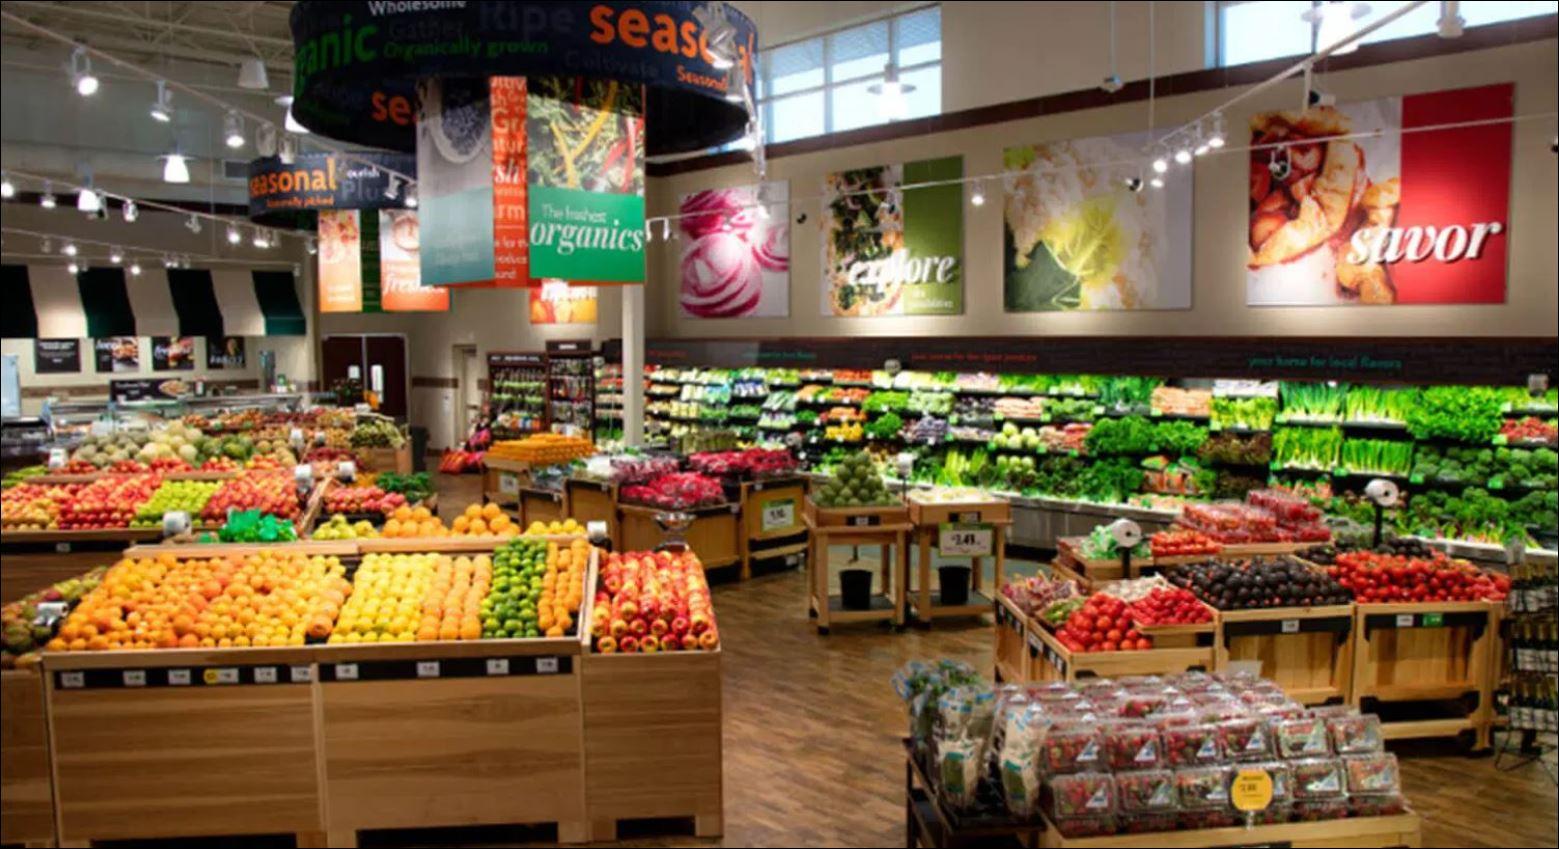 Woods Supermarket Customer Survey